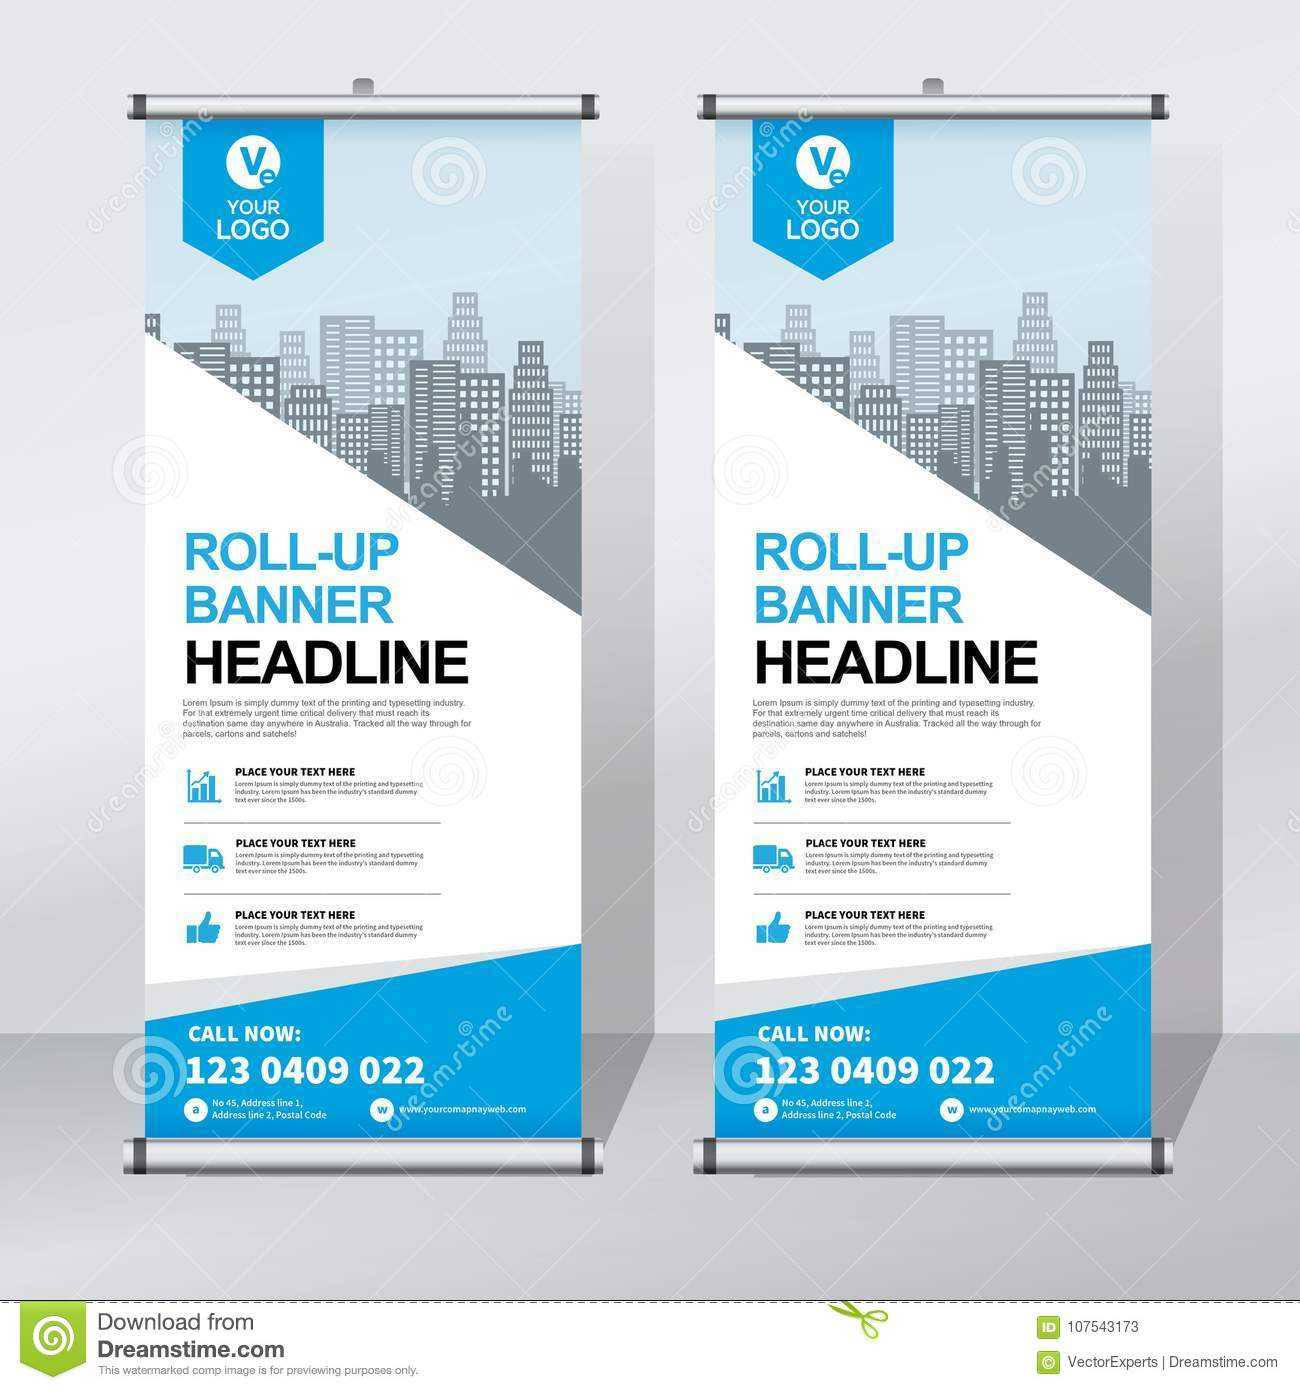 Roll Up Banner Design Template, Vertical, Abstract Regarding Pop Up Banner Design Template